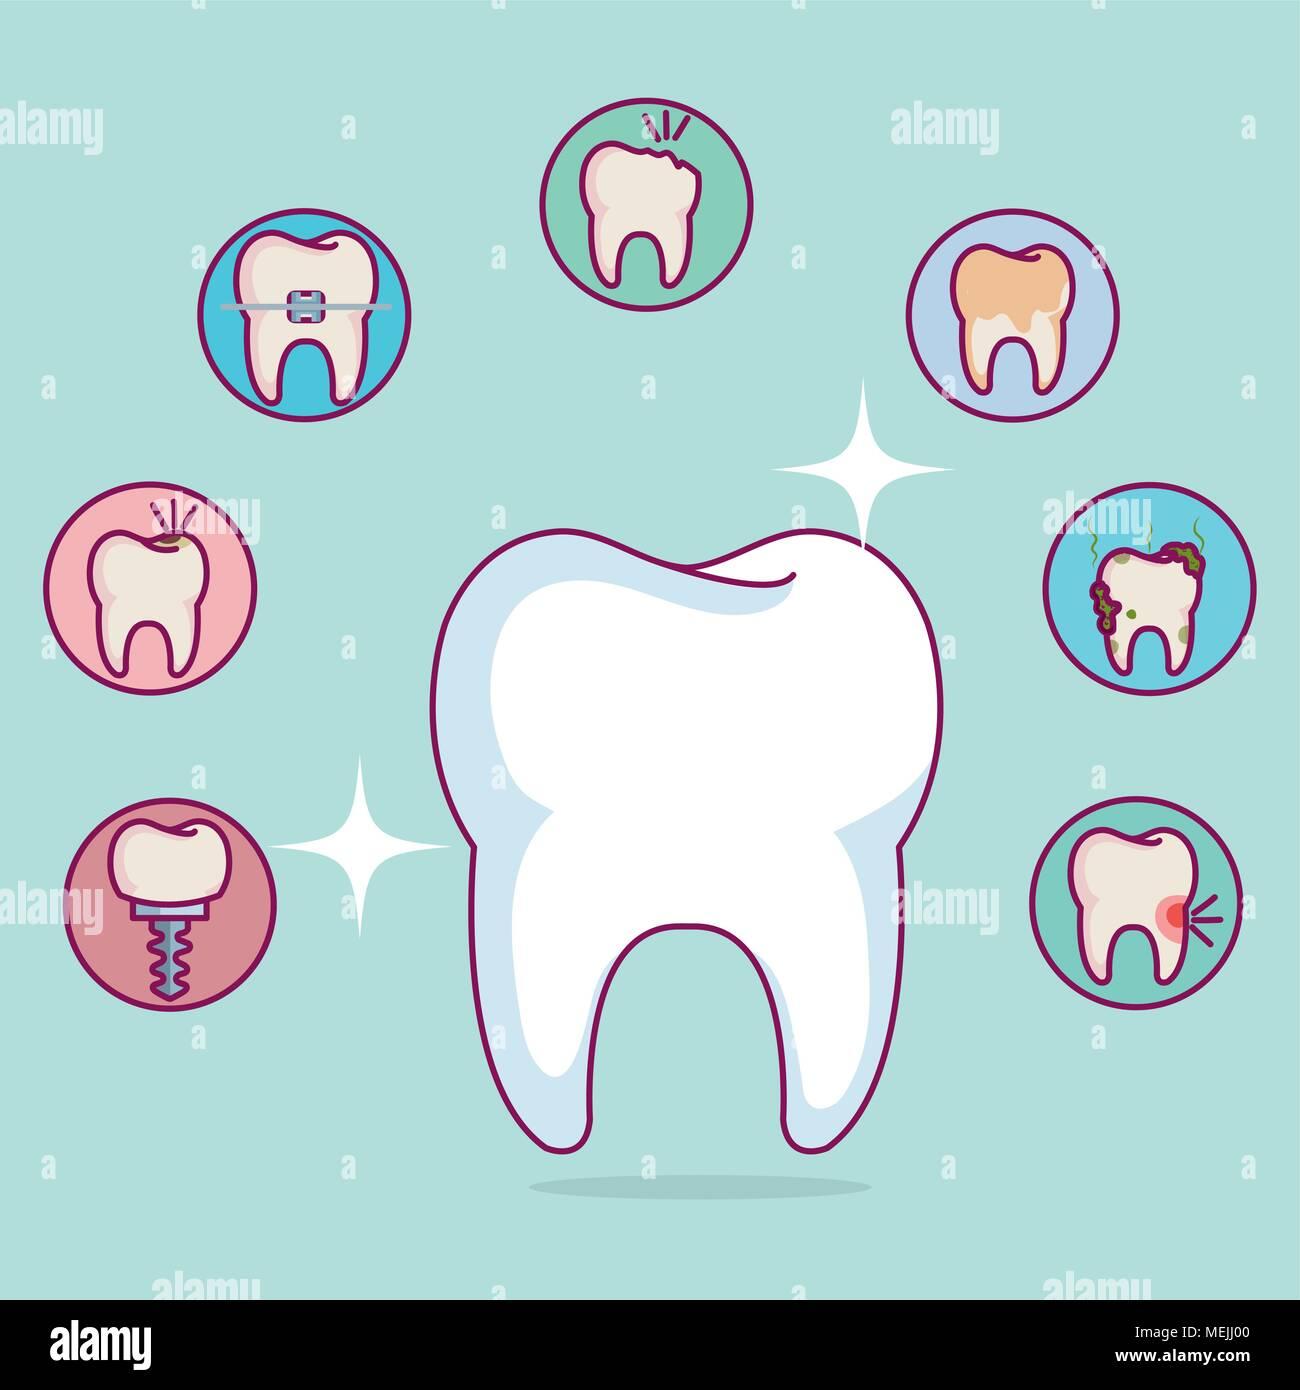 dental care set icons - Stock Image